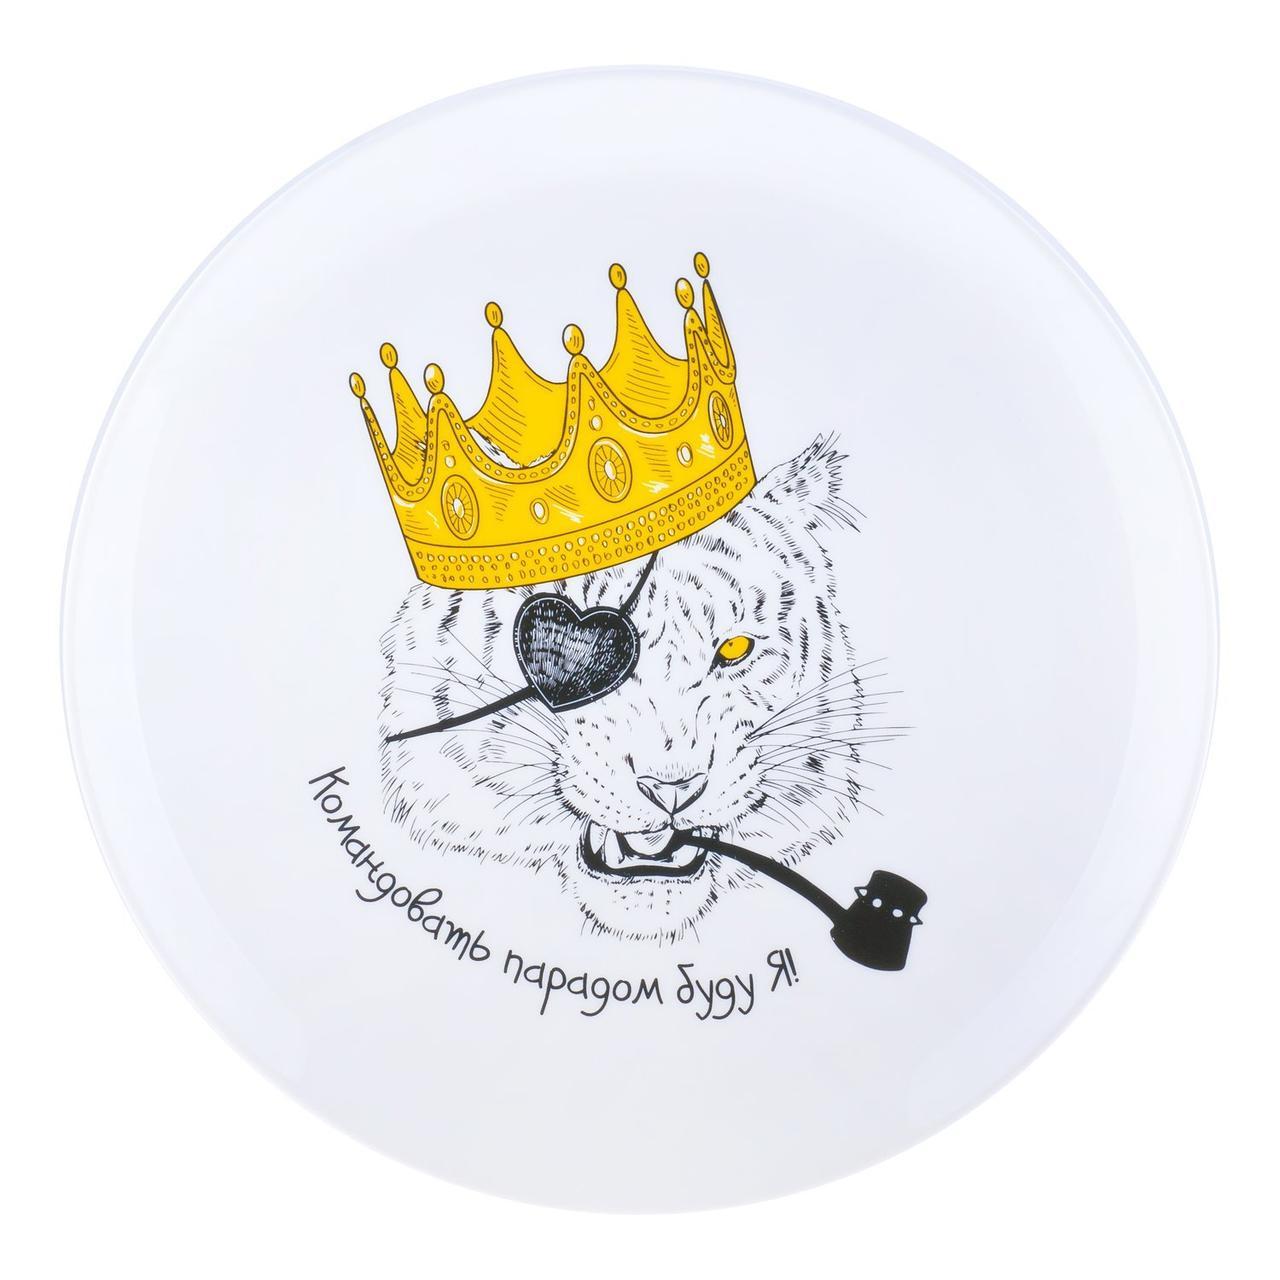 Тарелка Тигр - Командовать парадом буду я!